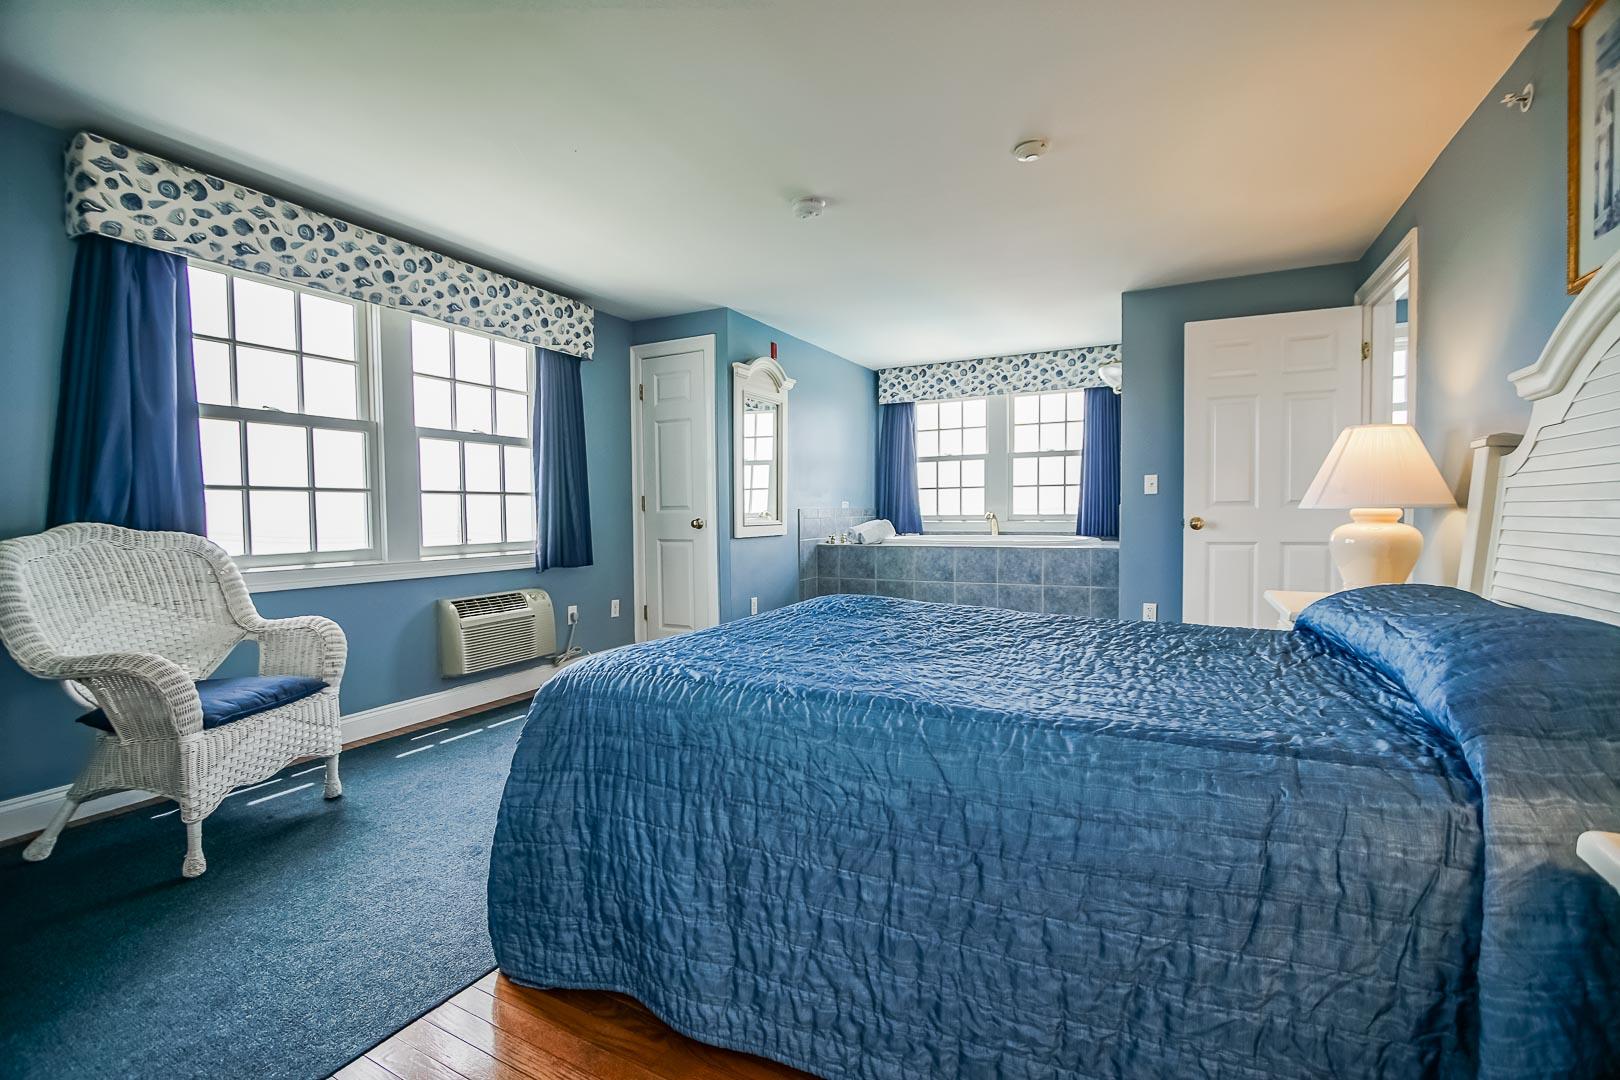 A spacious bedroom at VRI's Beachside Village Resort in Massachusetts.